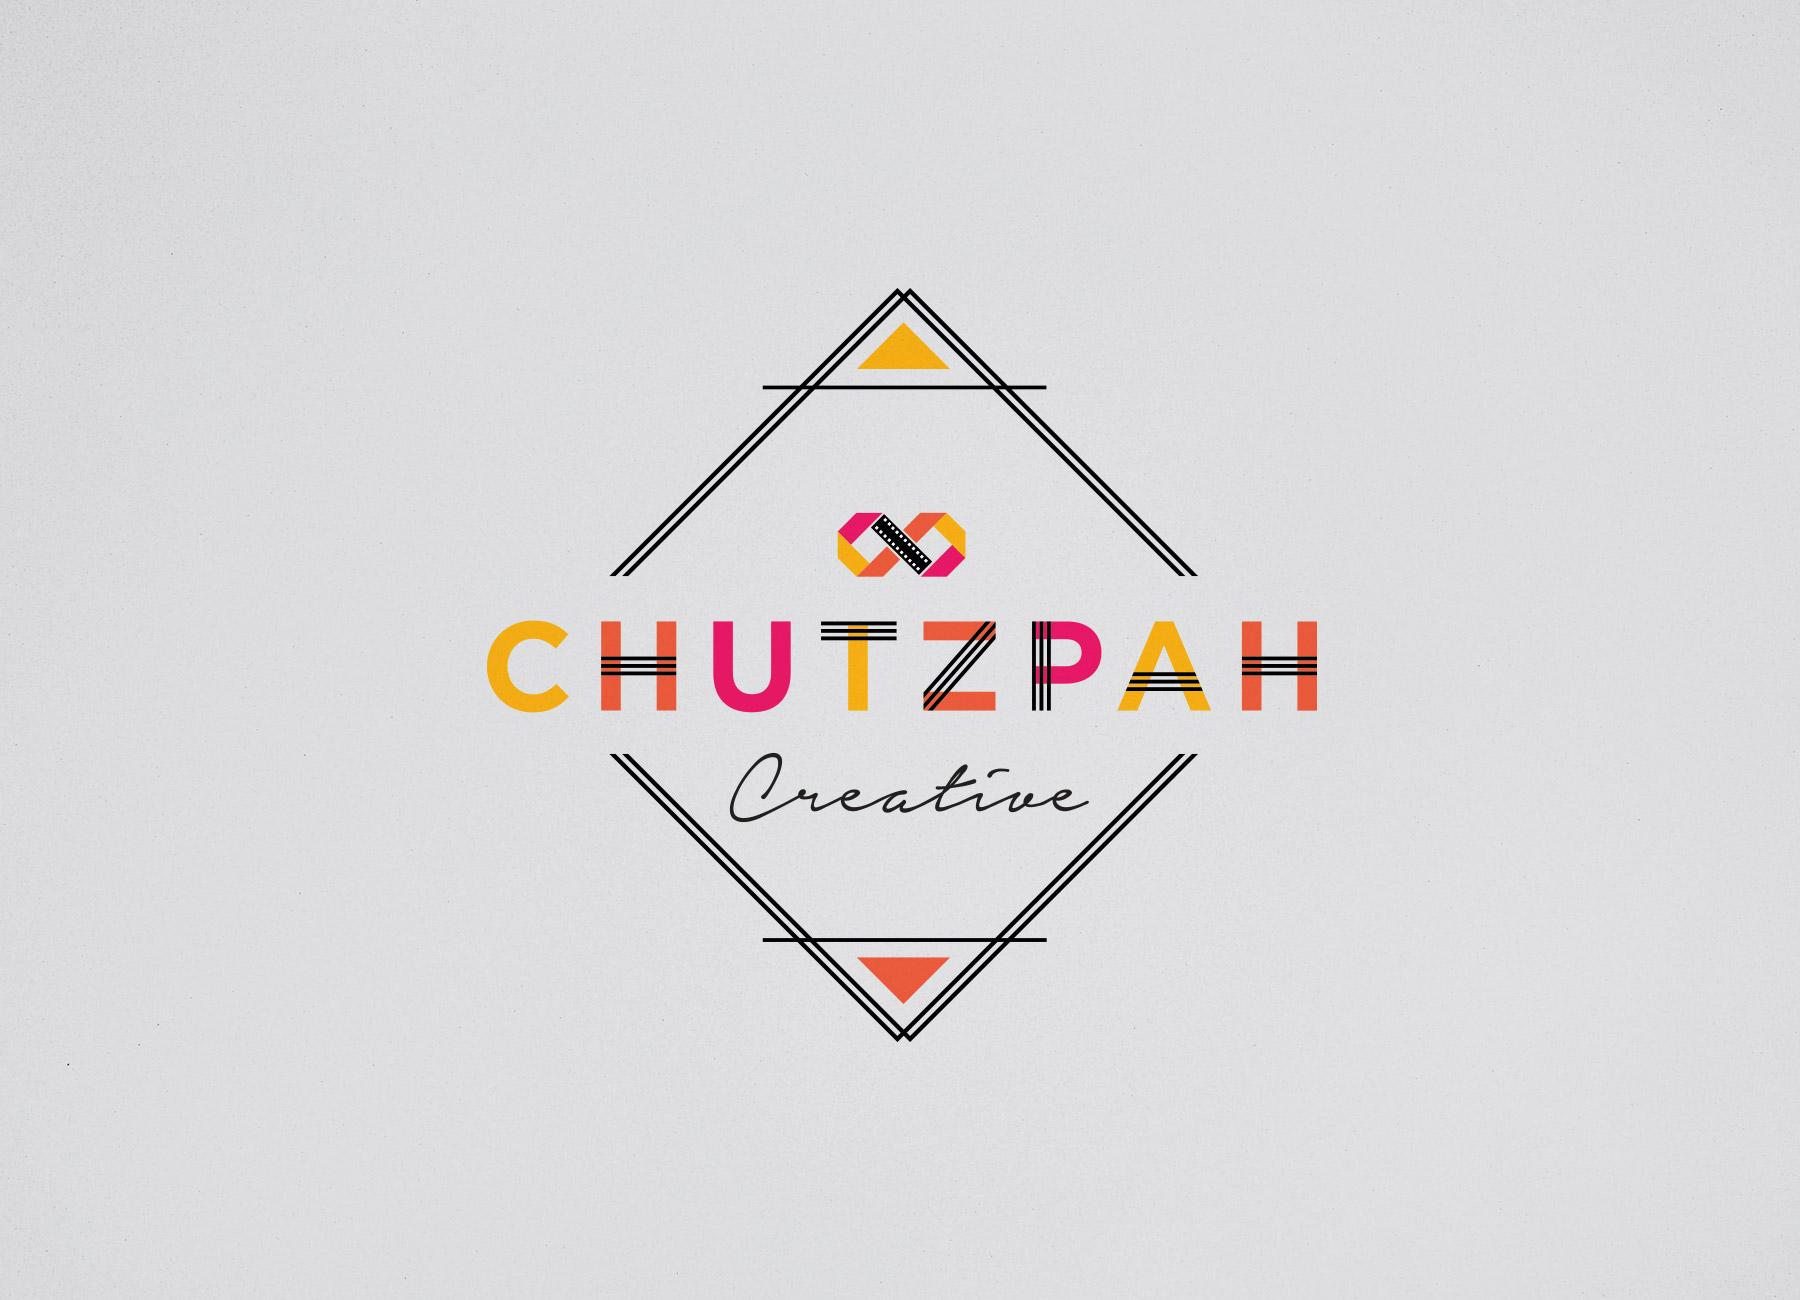 Branch | Chutzpah Creative